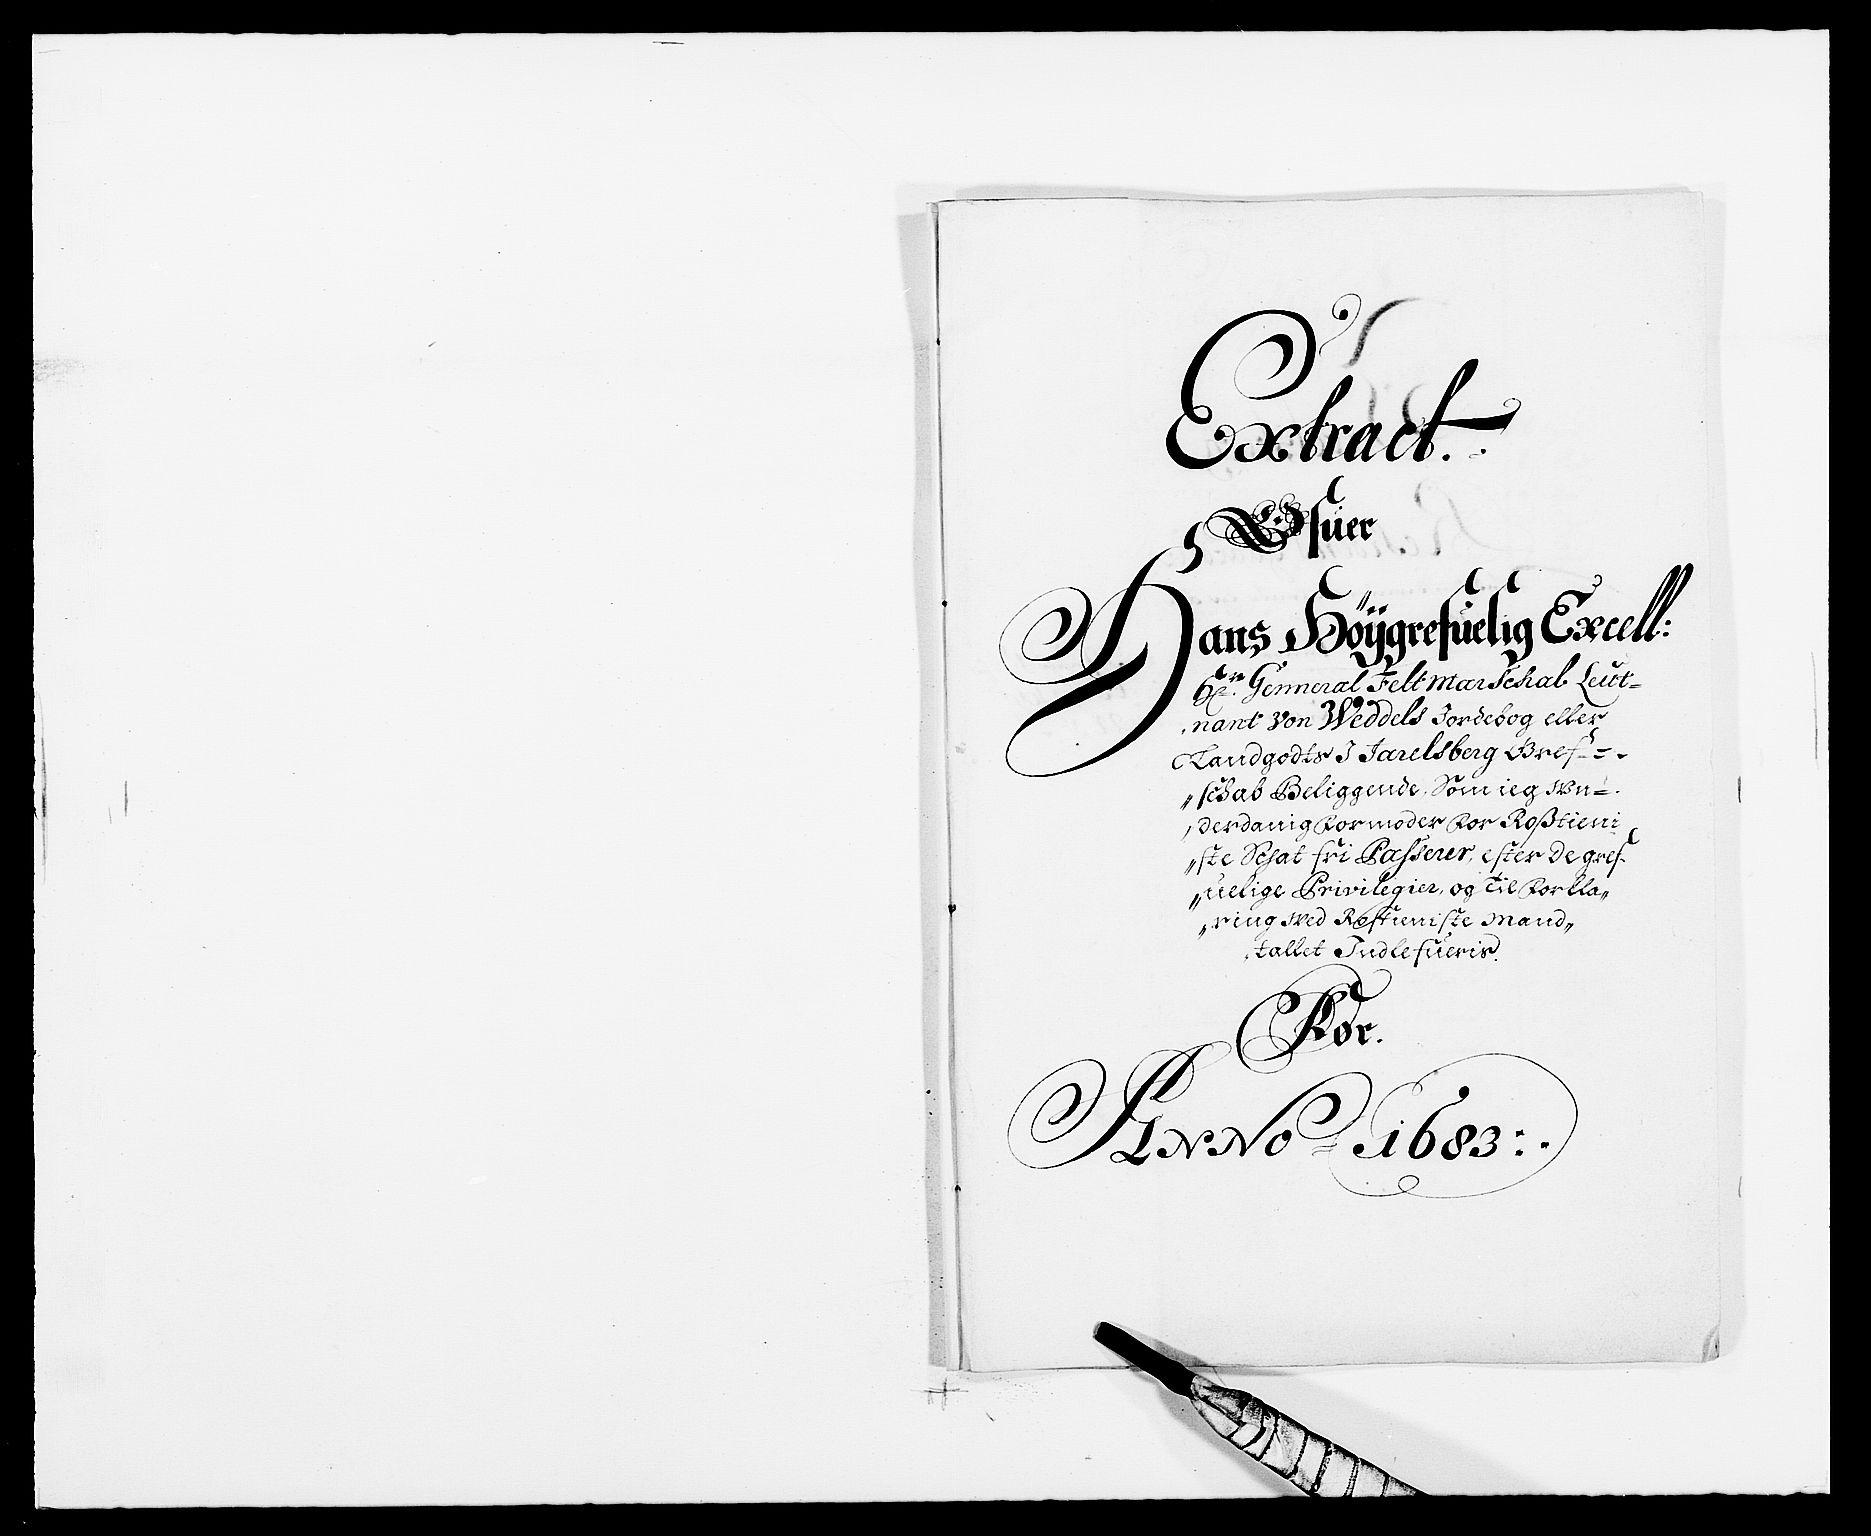 RA, Rentekammeret inntil 1814, Reviderte regnskaper, Fogderegnskap, R32/L1853: Fogderegnskap Jarlsberg grevskap, 1683, s. 115